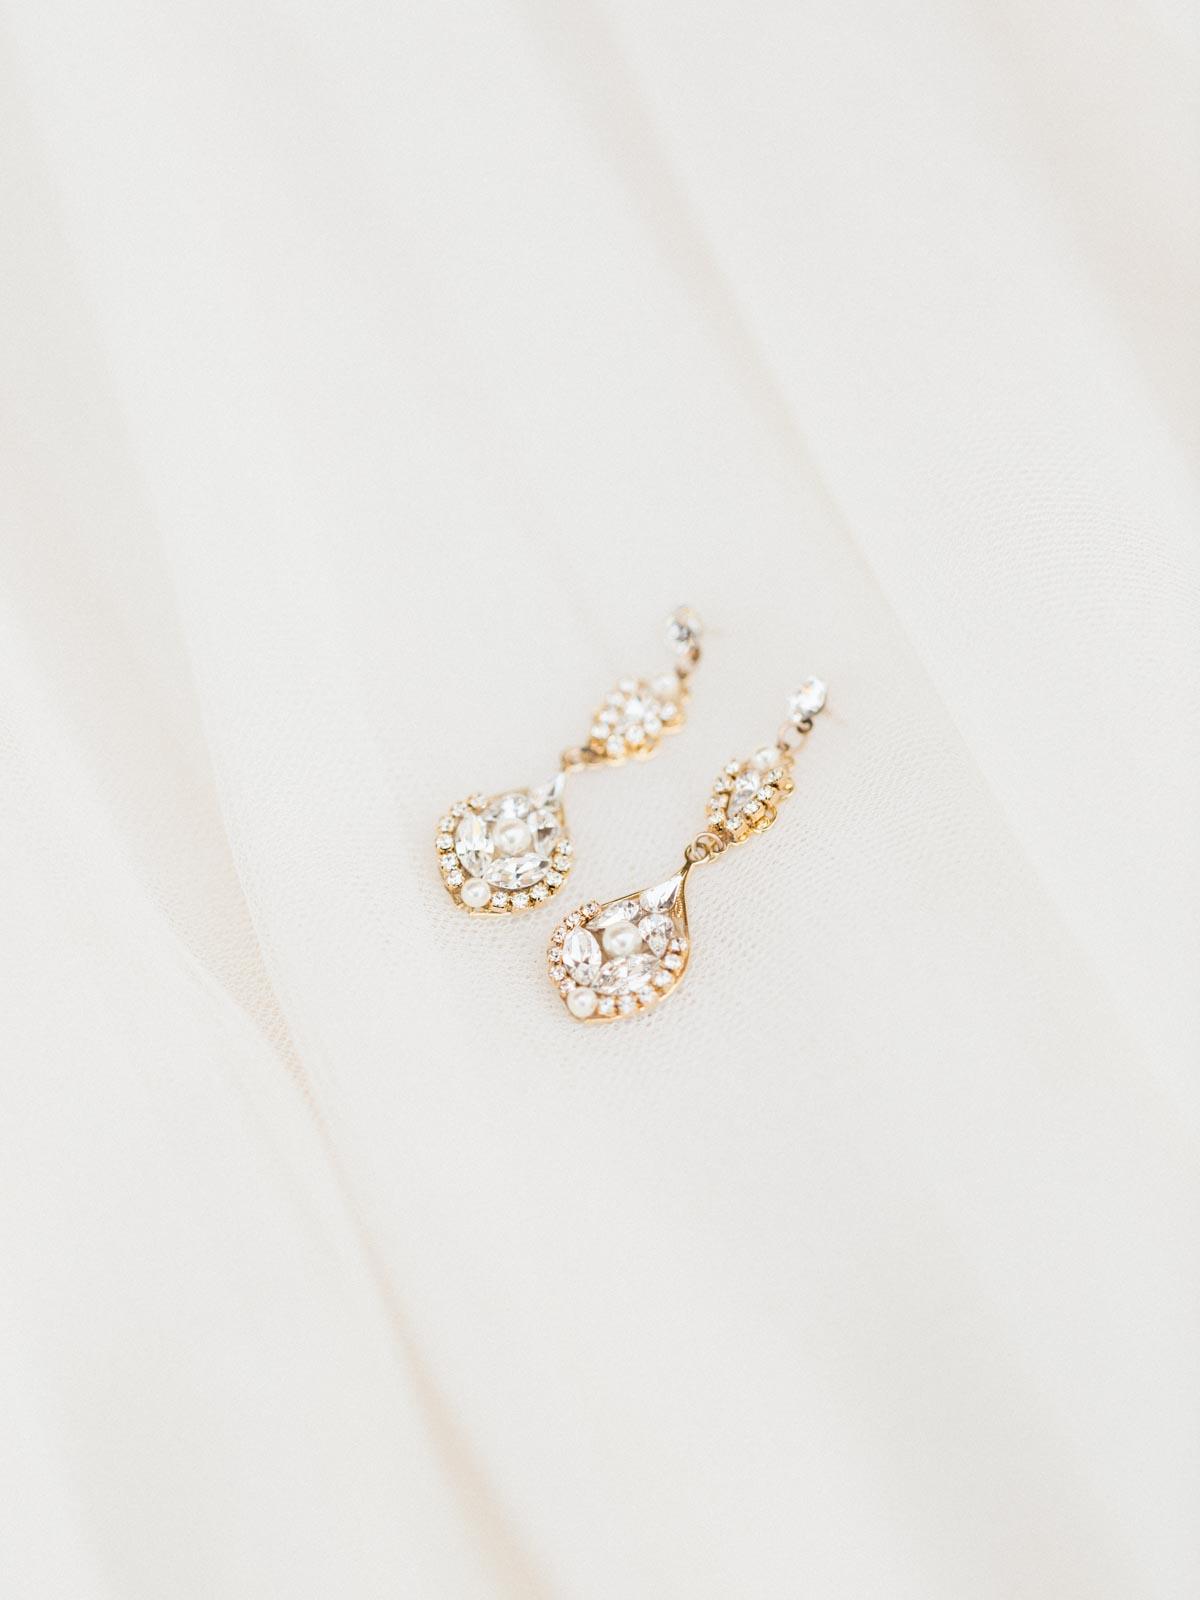 Beautiful wedding day earrings